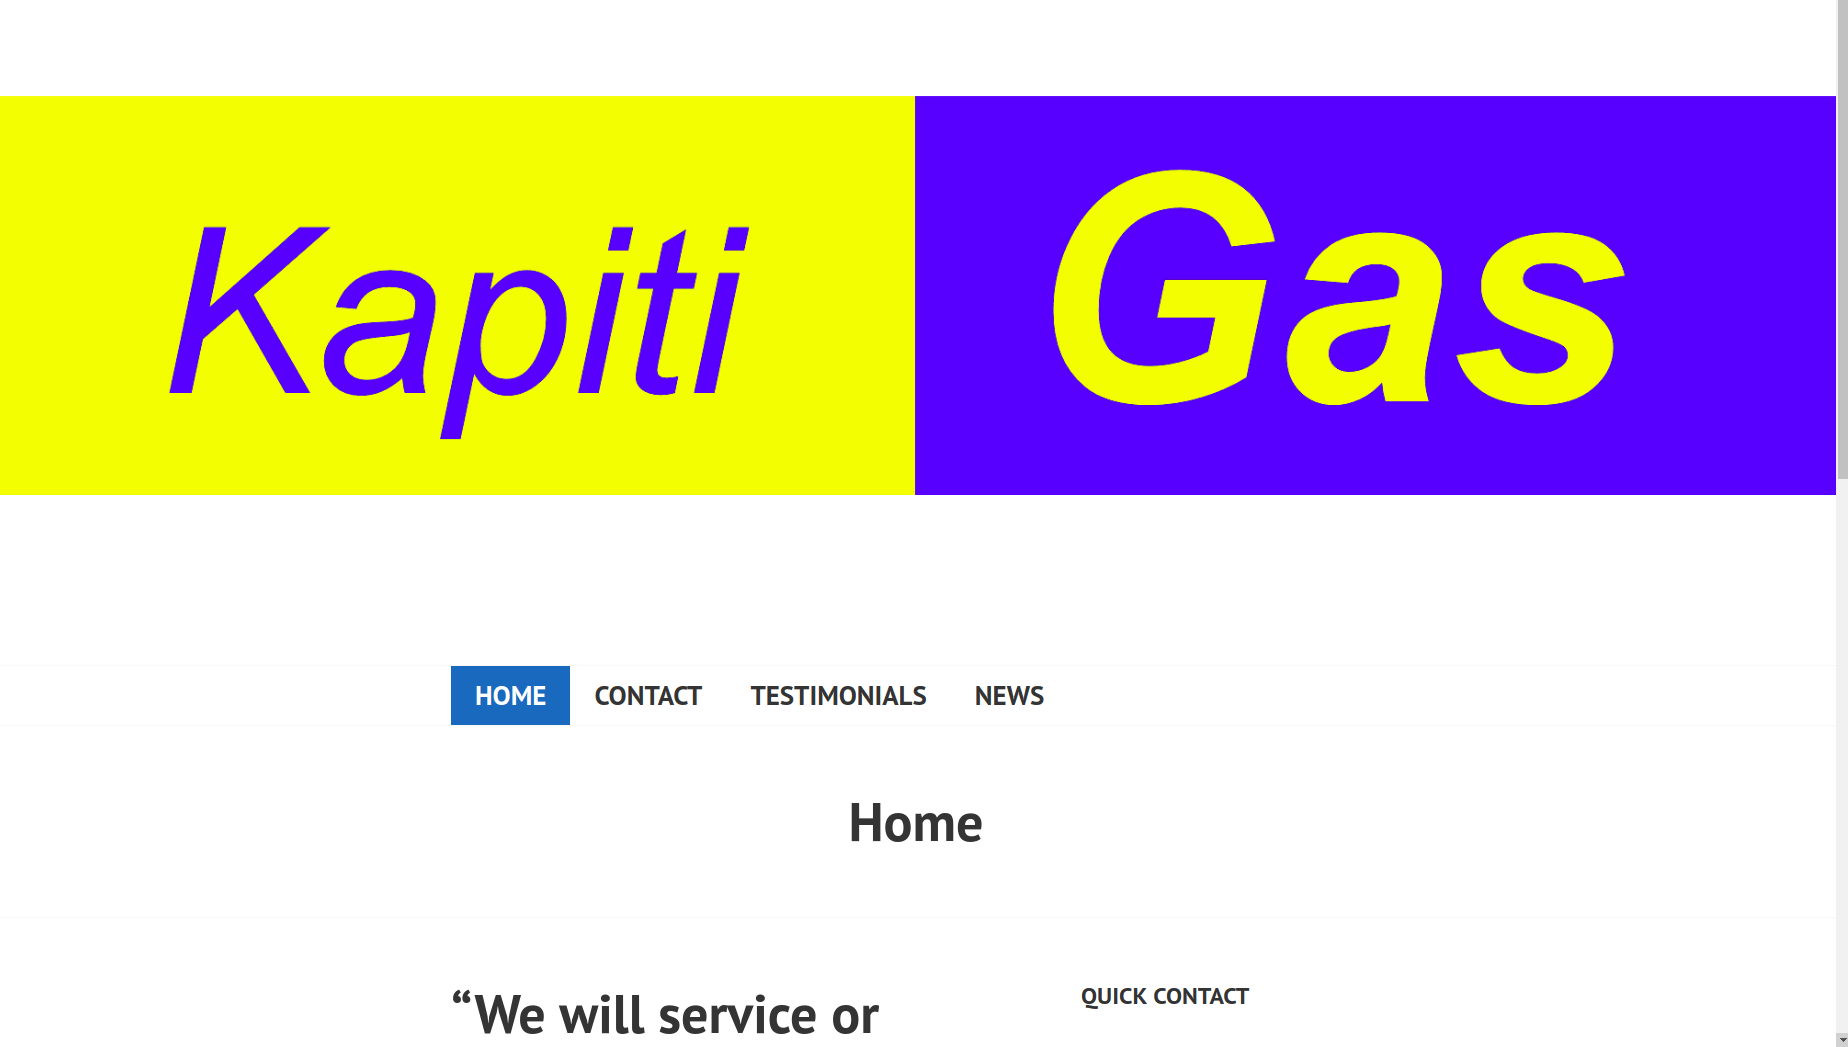 Website of kapiti gas